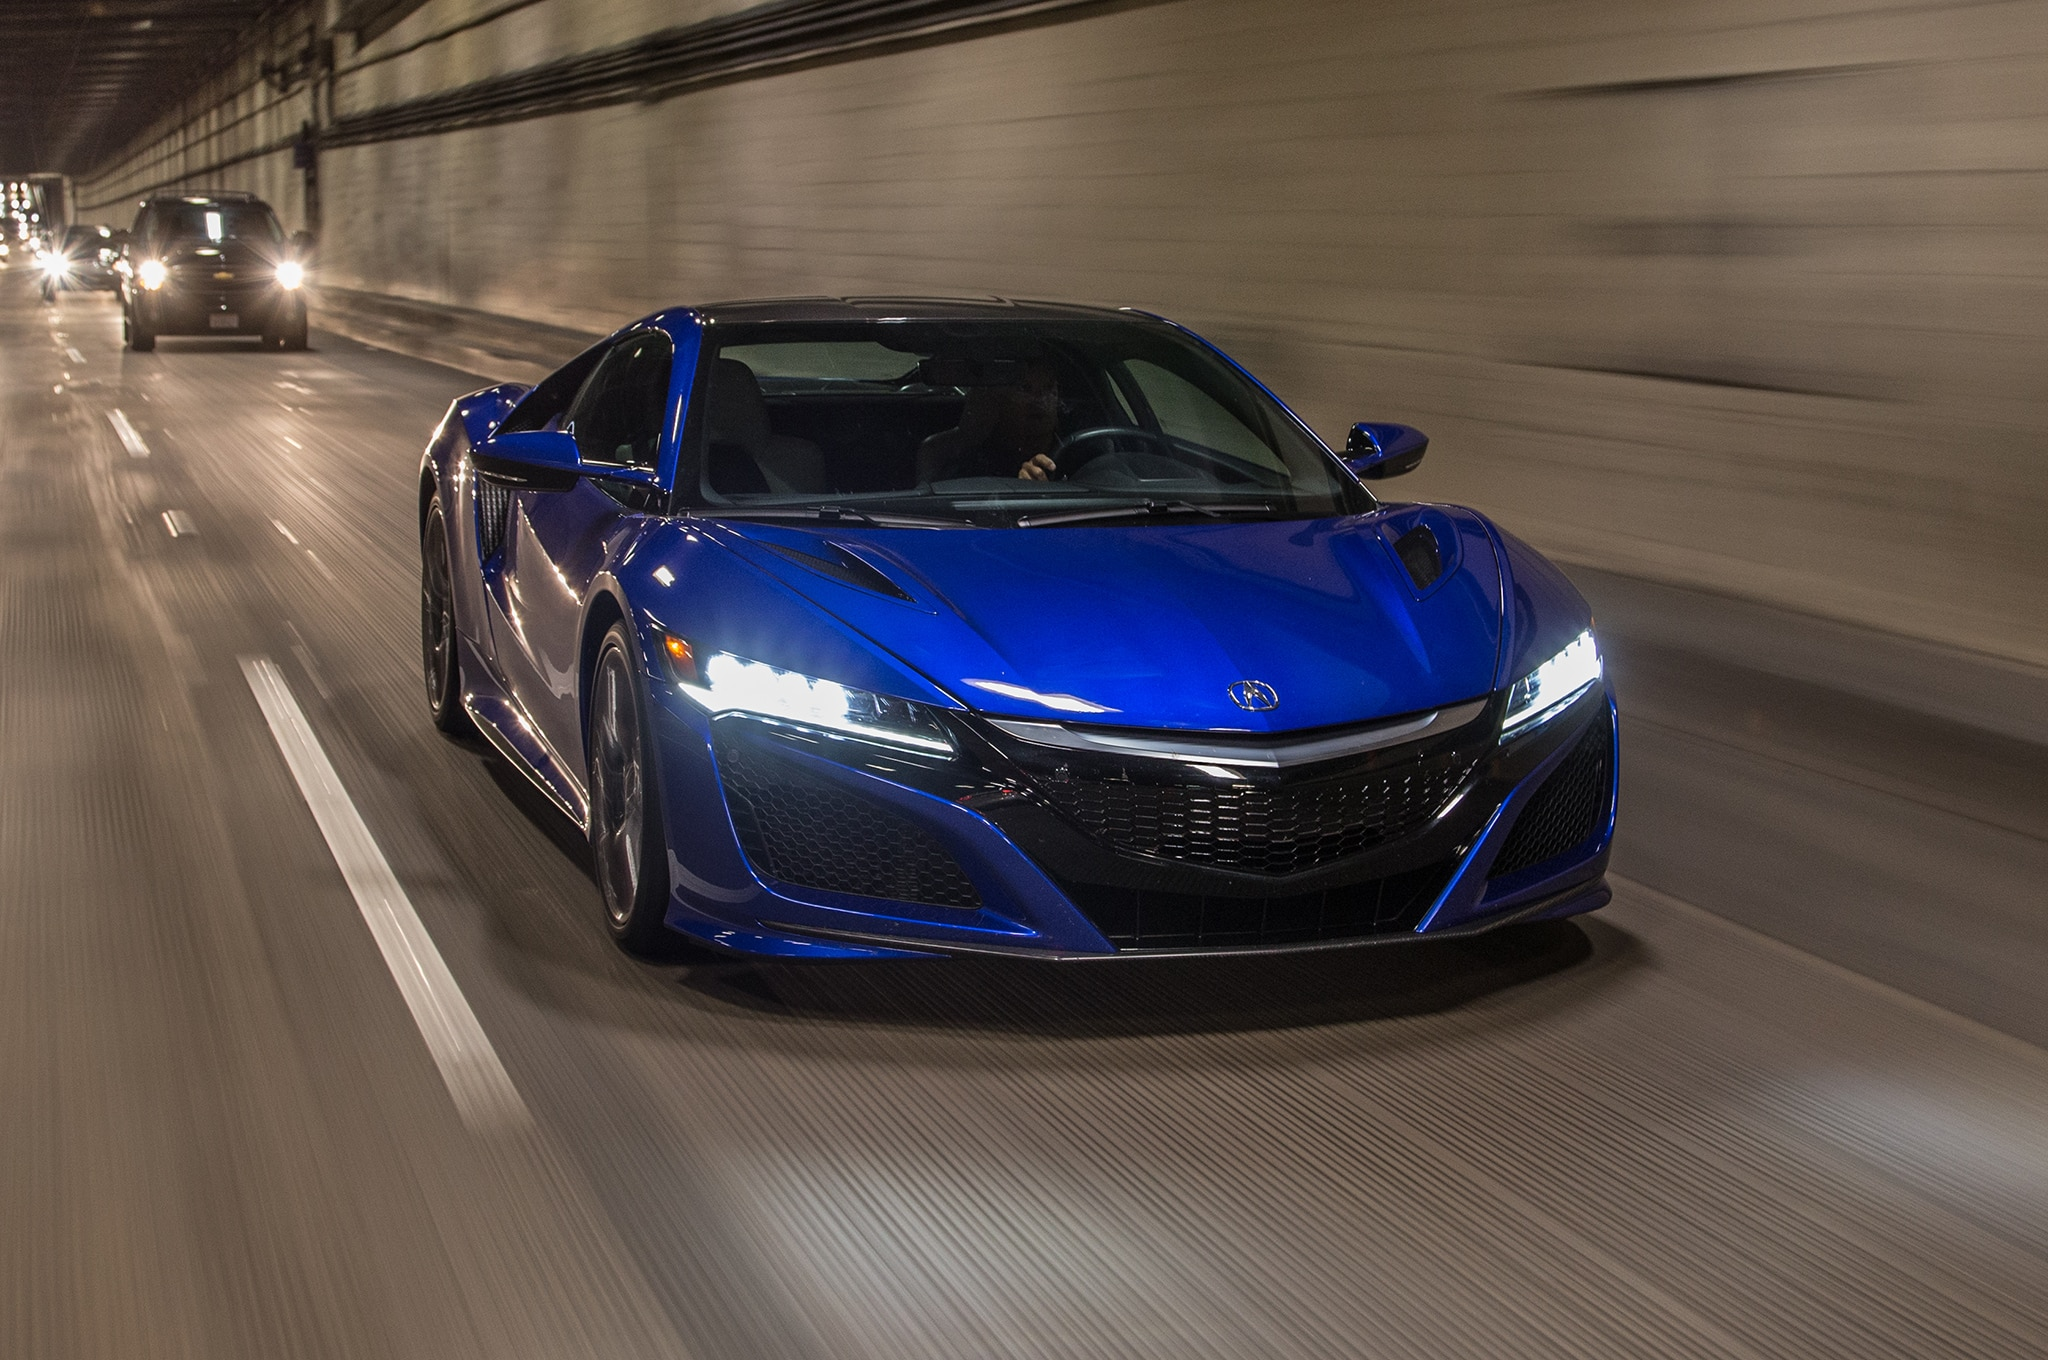 2017 Acura NSX Goes Head 2 Head with Nissan GT-R